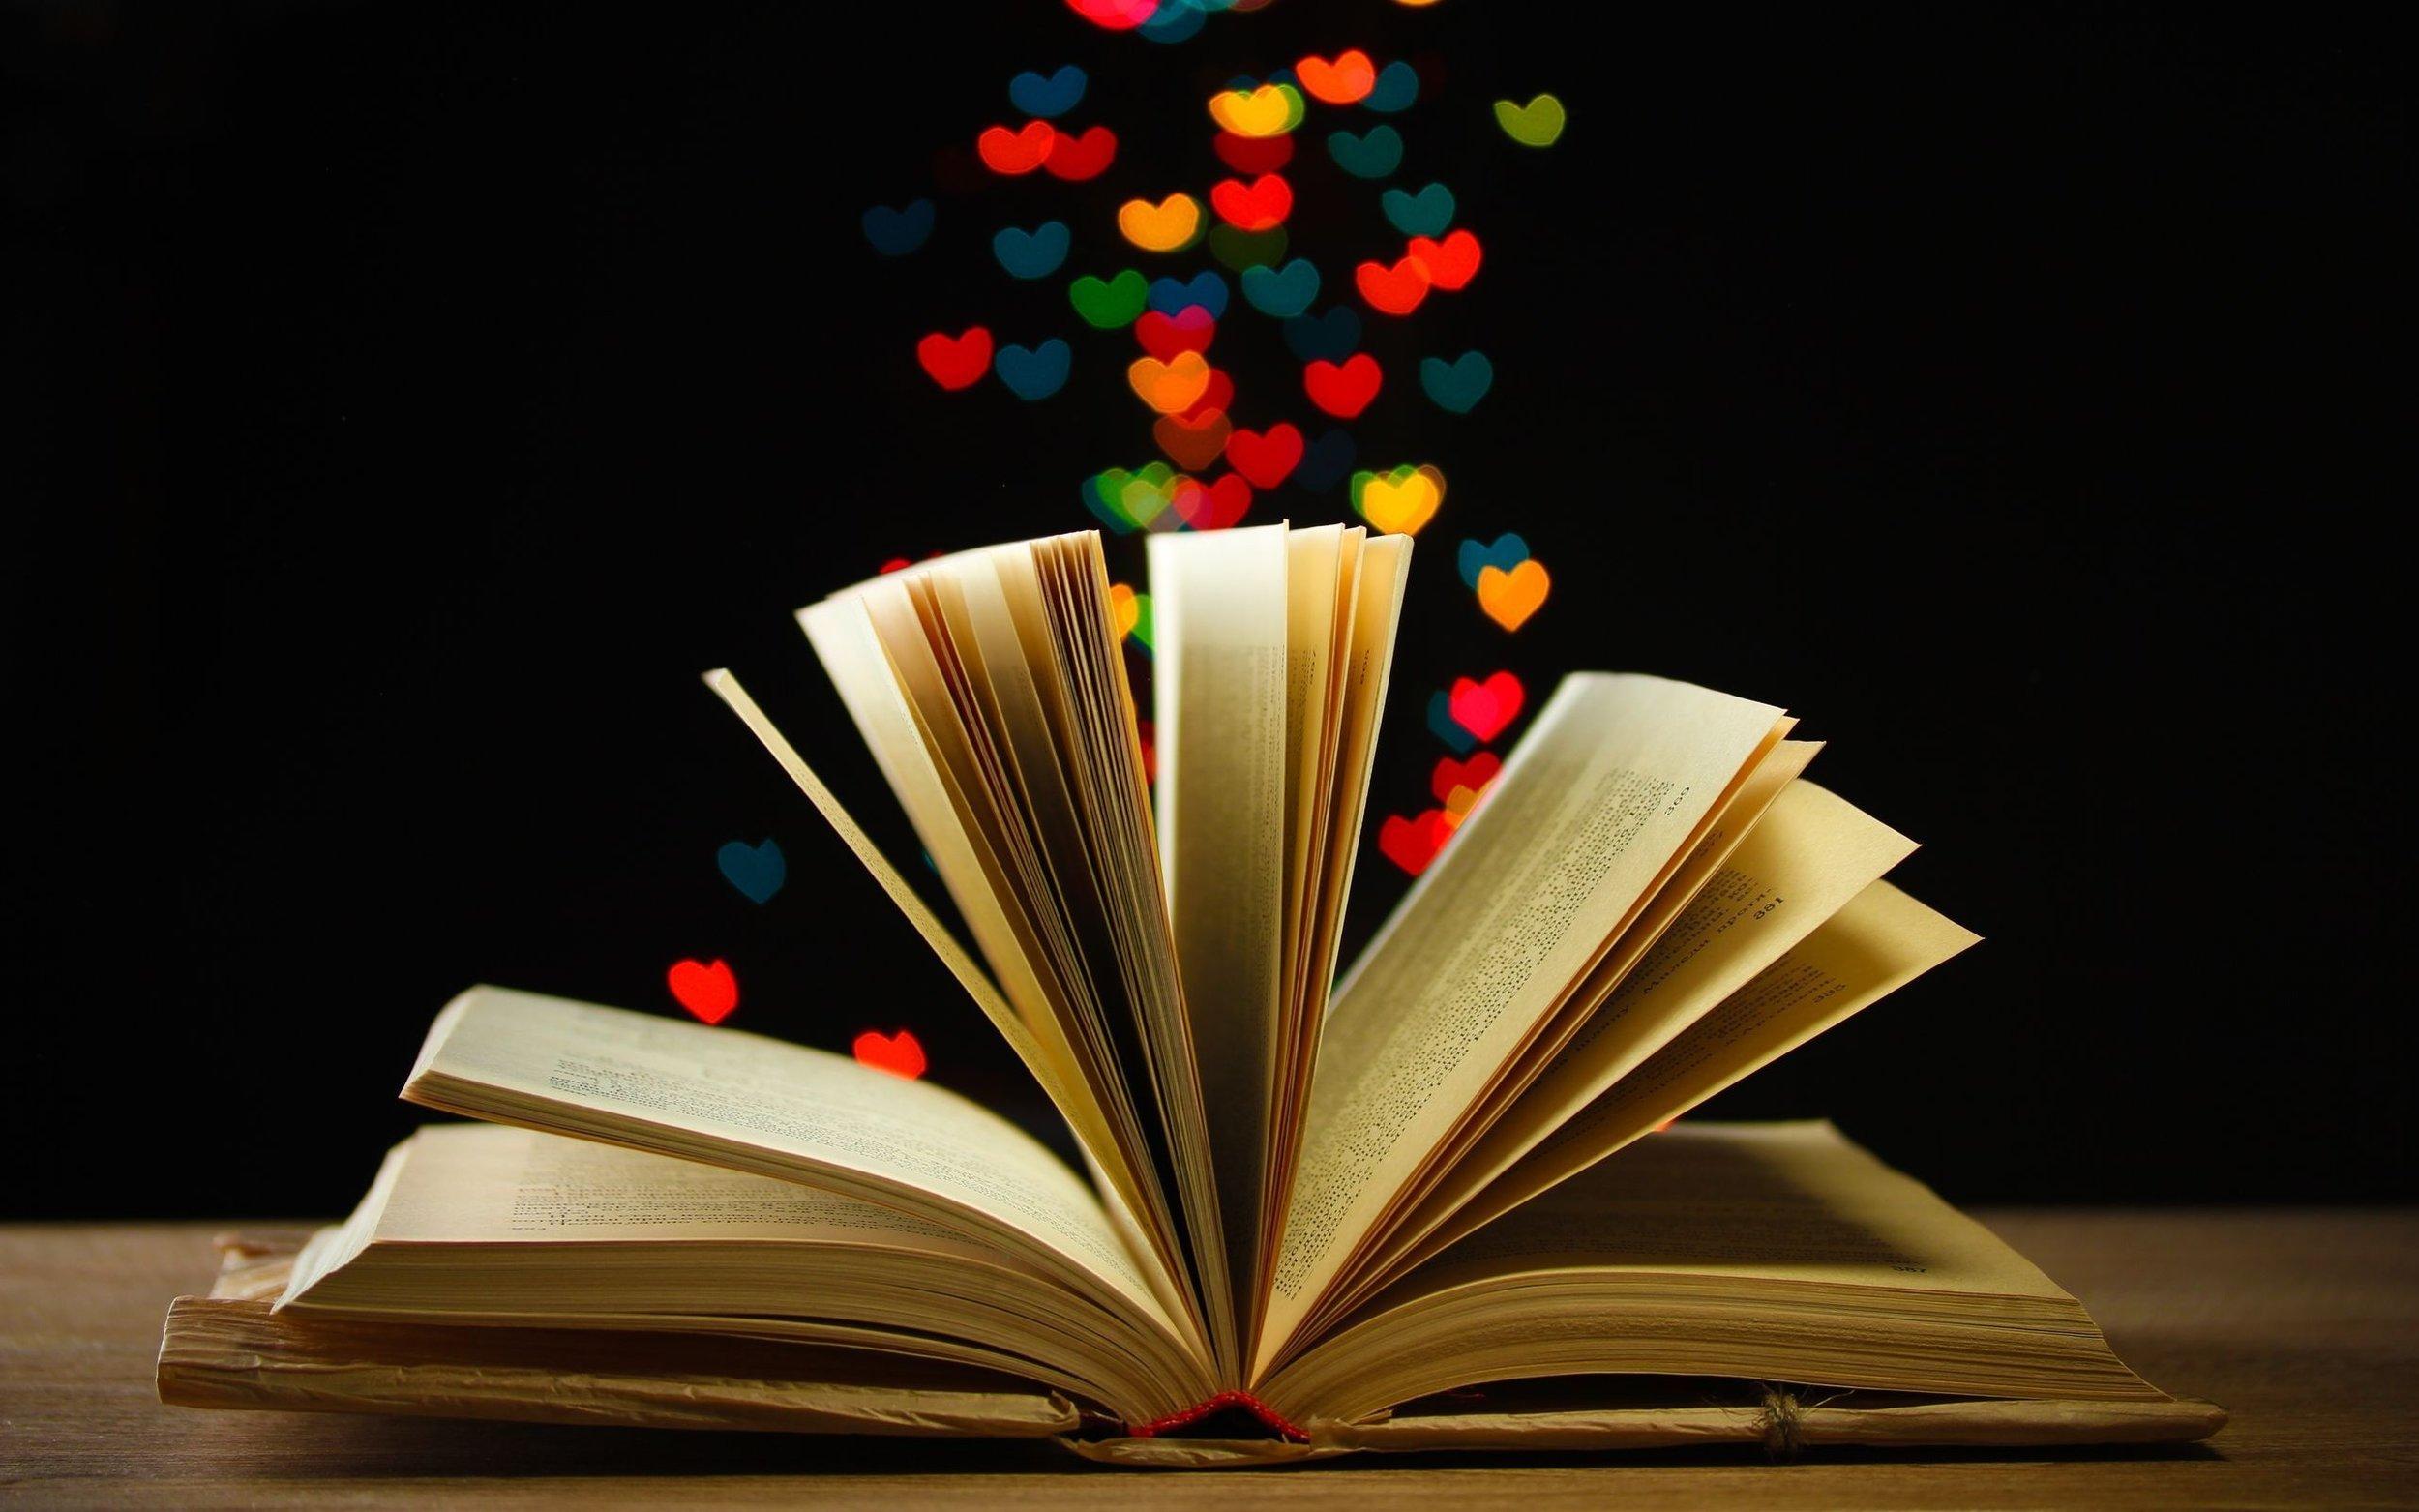 Book-opened-love-hearts_2560x1600.jpg